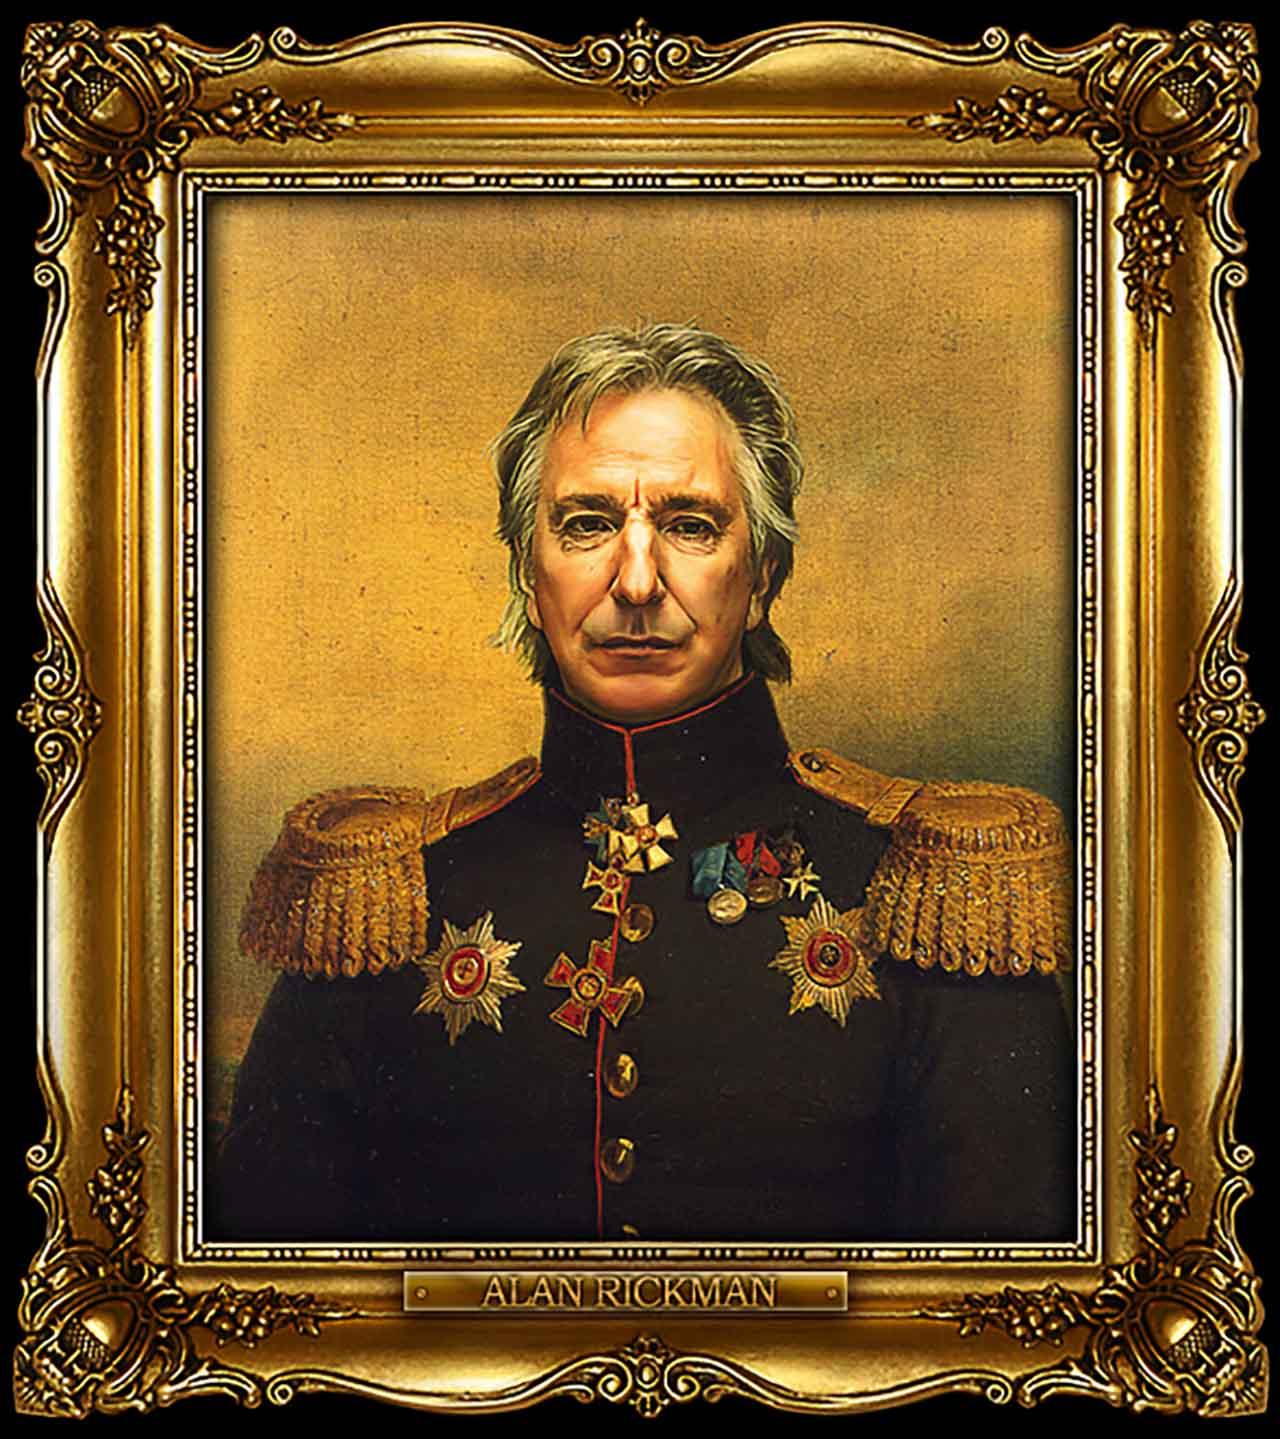 Artist Turns Famous Actors Into Russian Generals - Alan Rickman